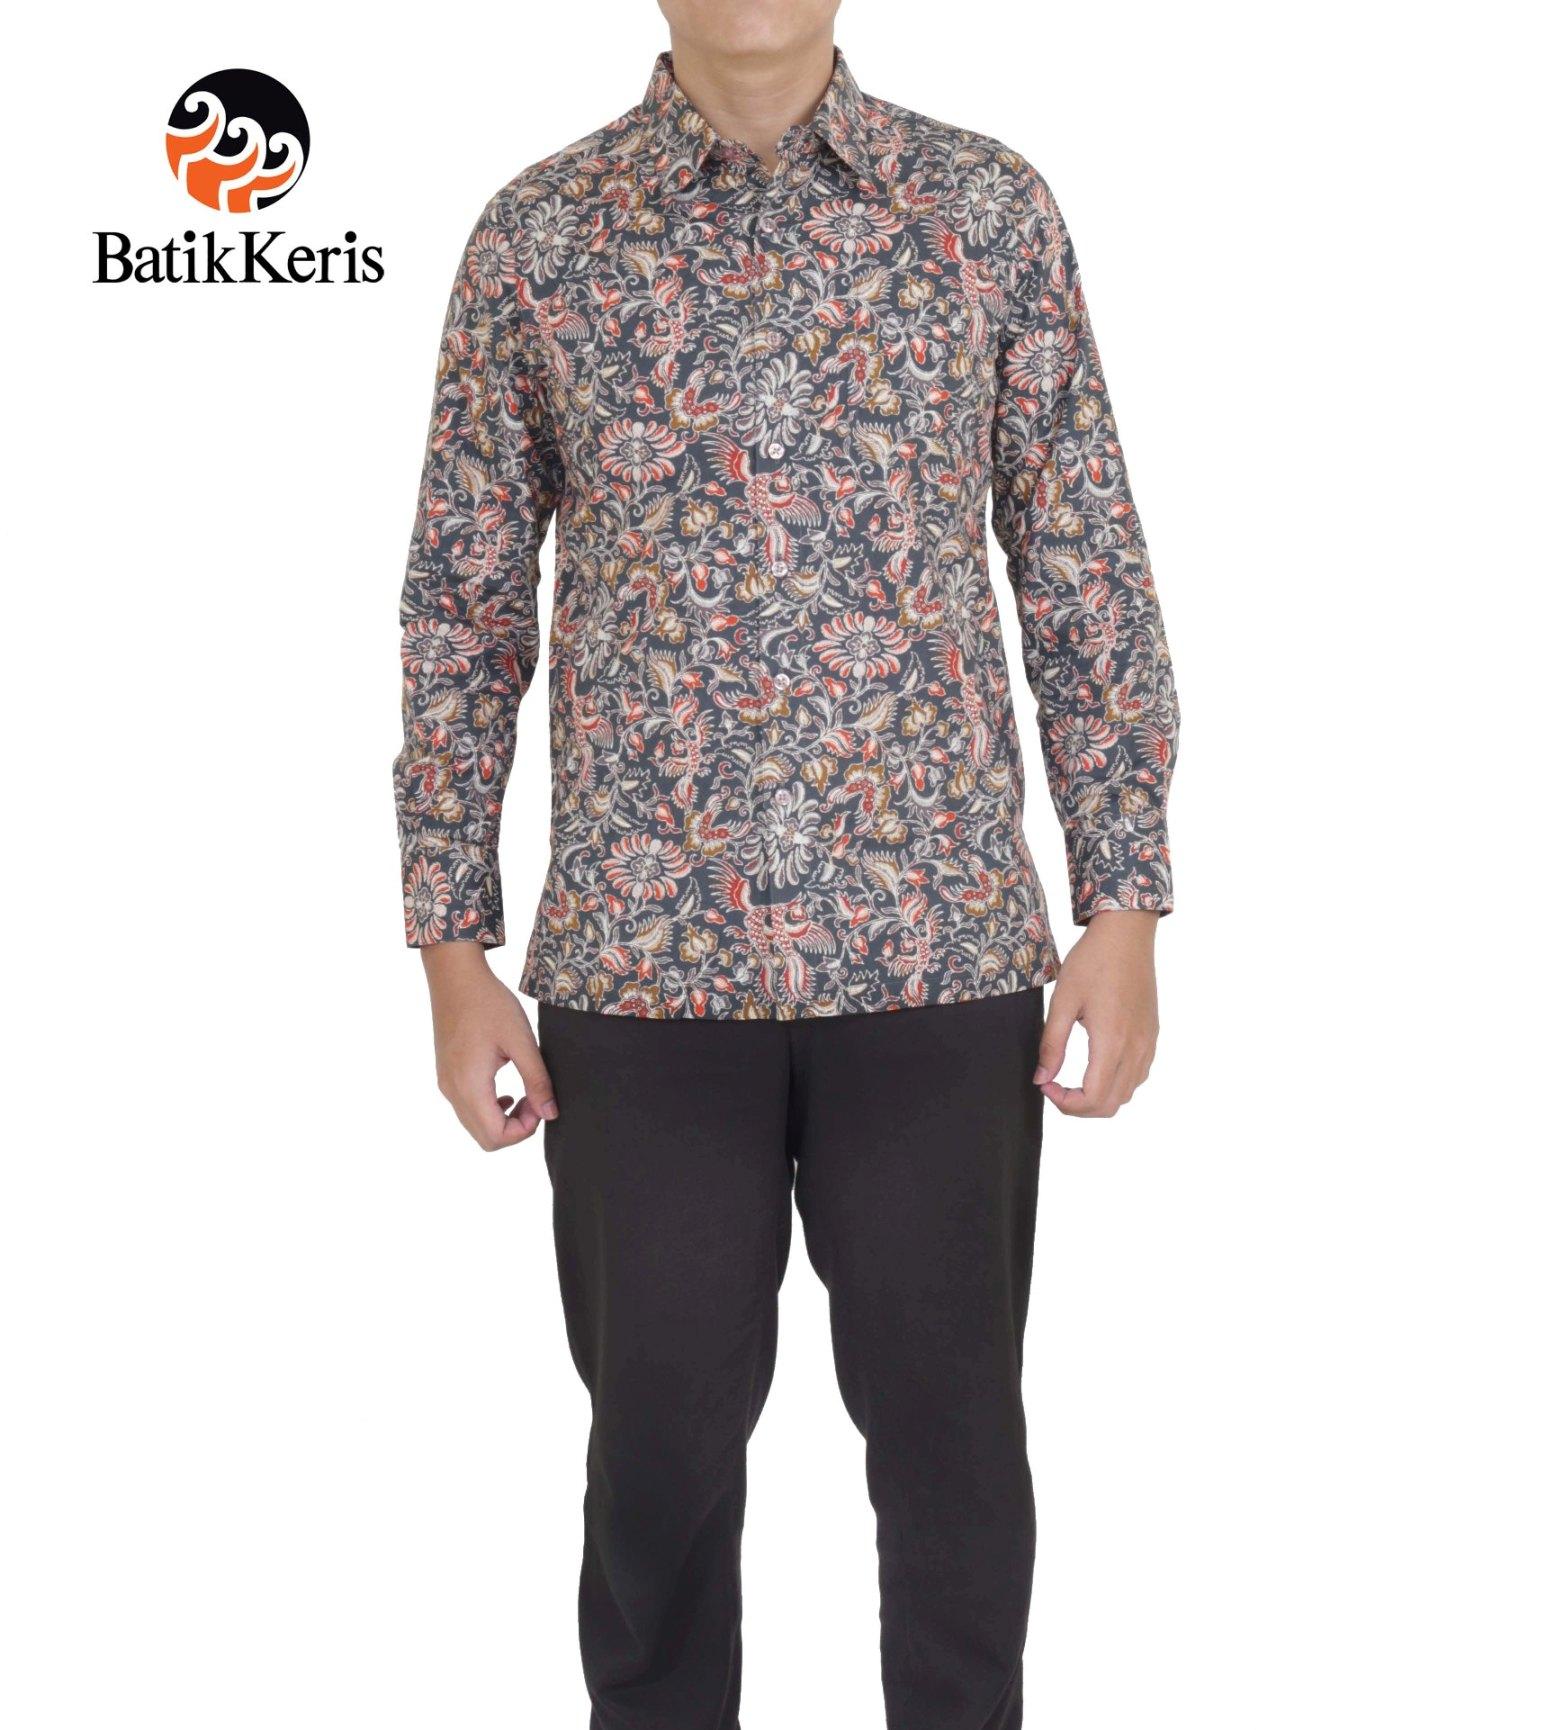 Batik Keris Online » KEMEJA BATIK SLIMFIT LENGAN PANJANG MOTIF ... 3c09f4d7a4